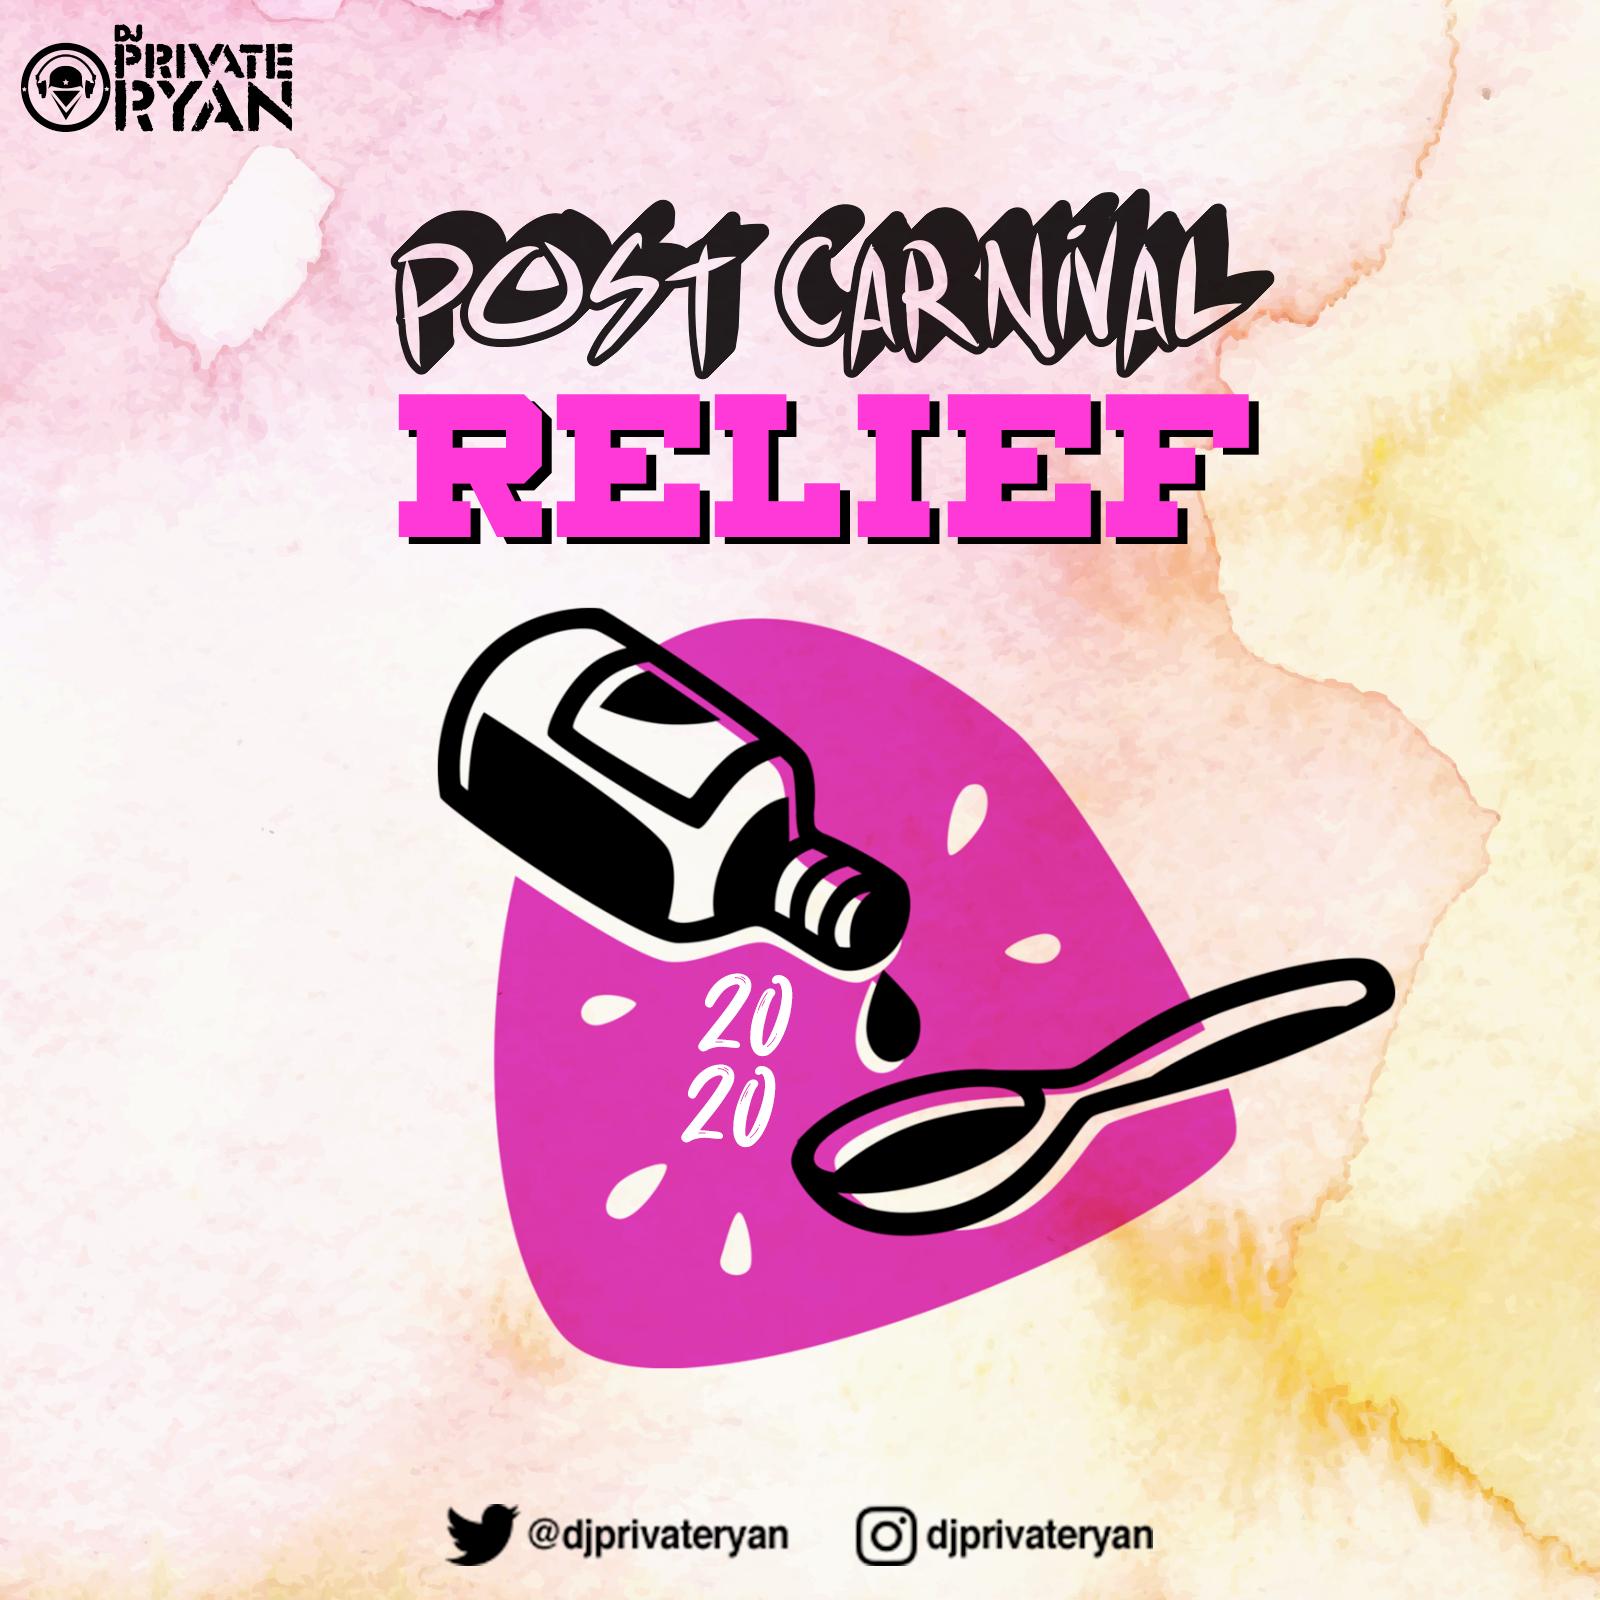 Private Ryan Presents Post Carnival Relief 2020 (The Road Essentials)